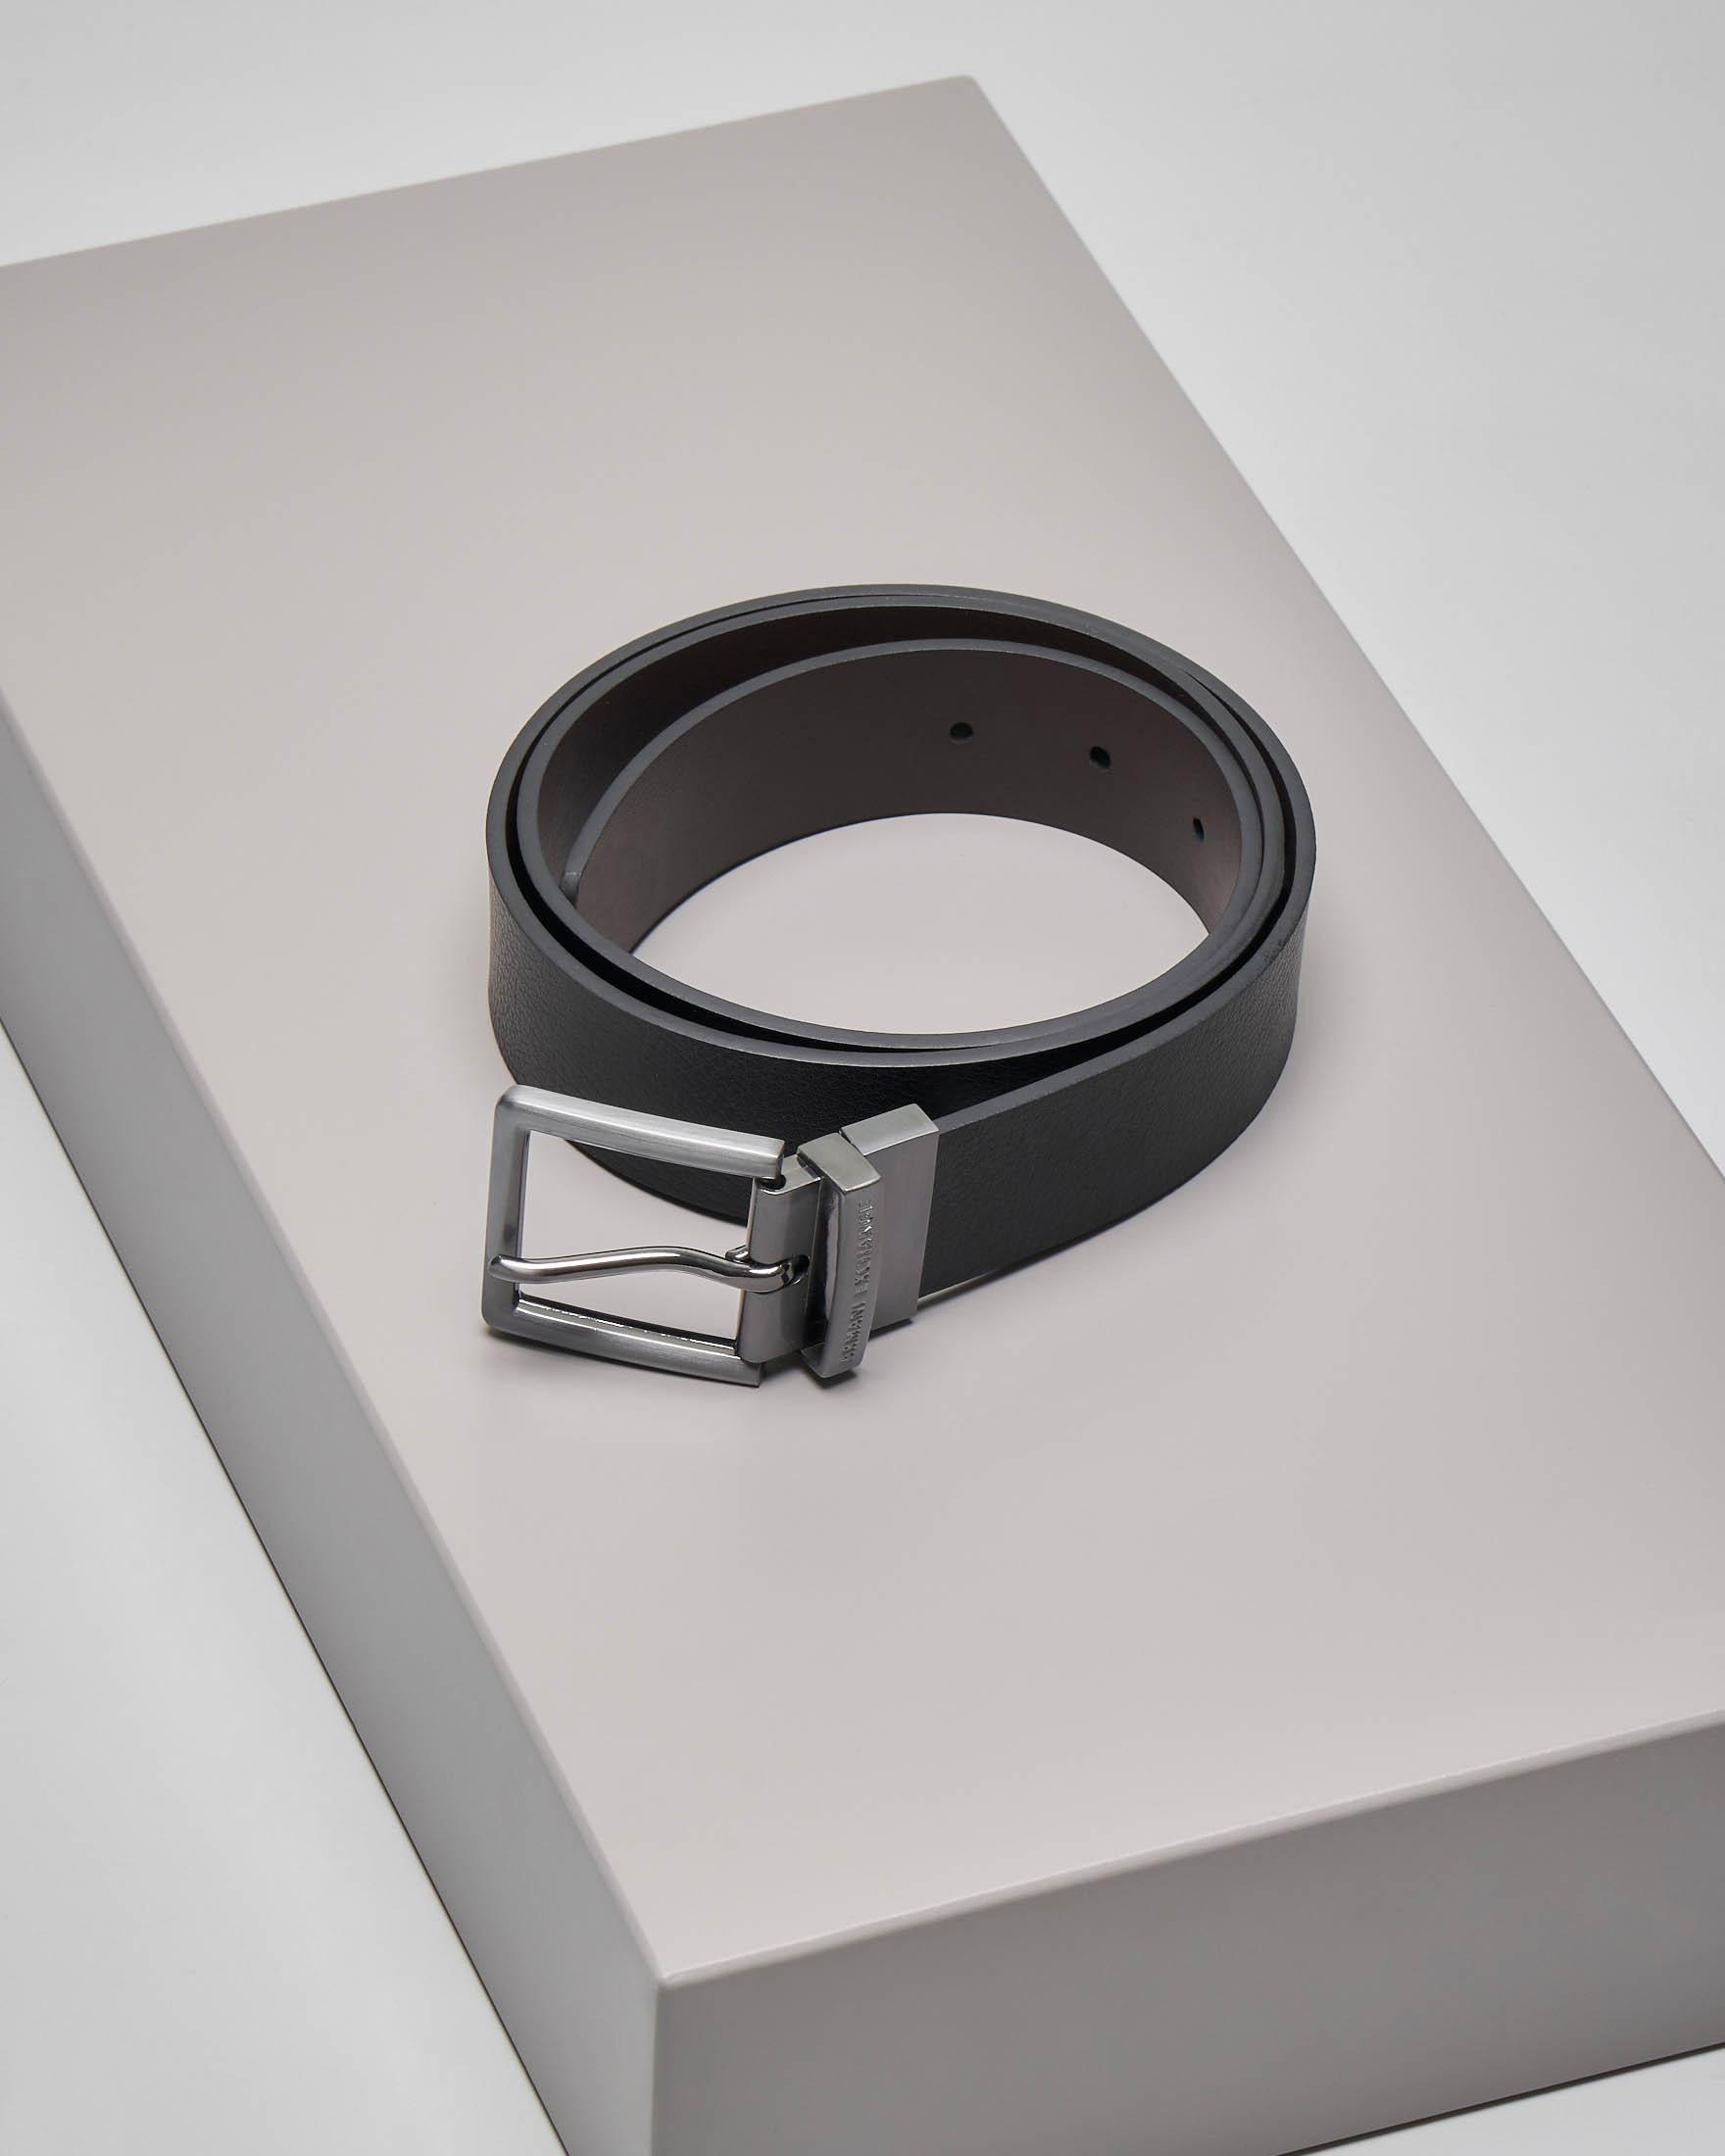 Cintura nera in pelle martellata reversibile in moro